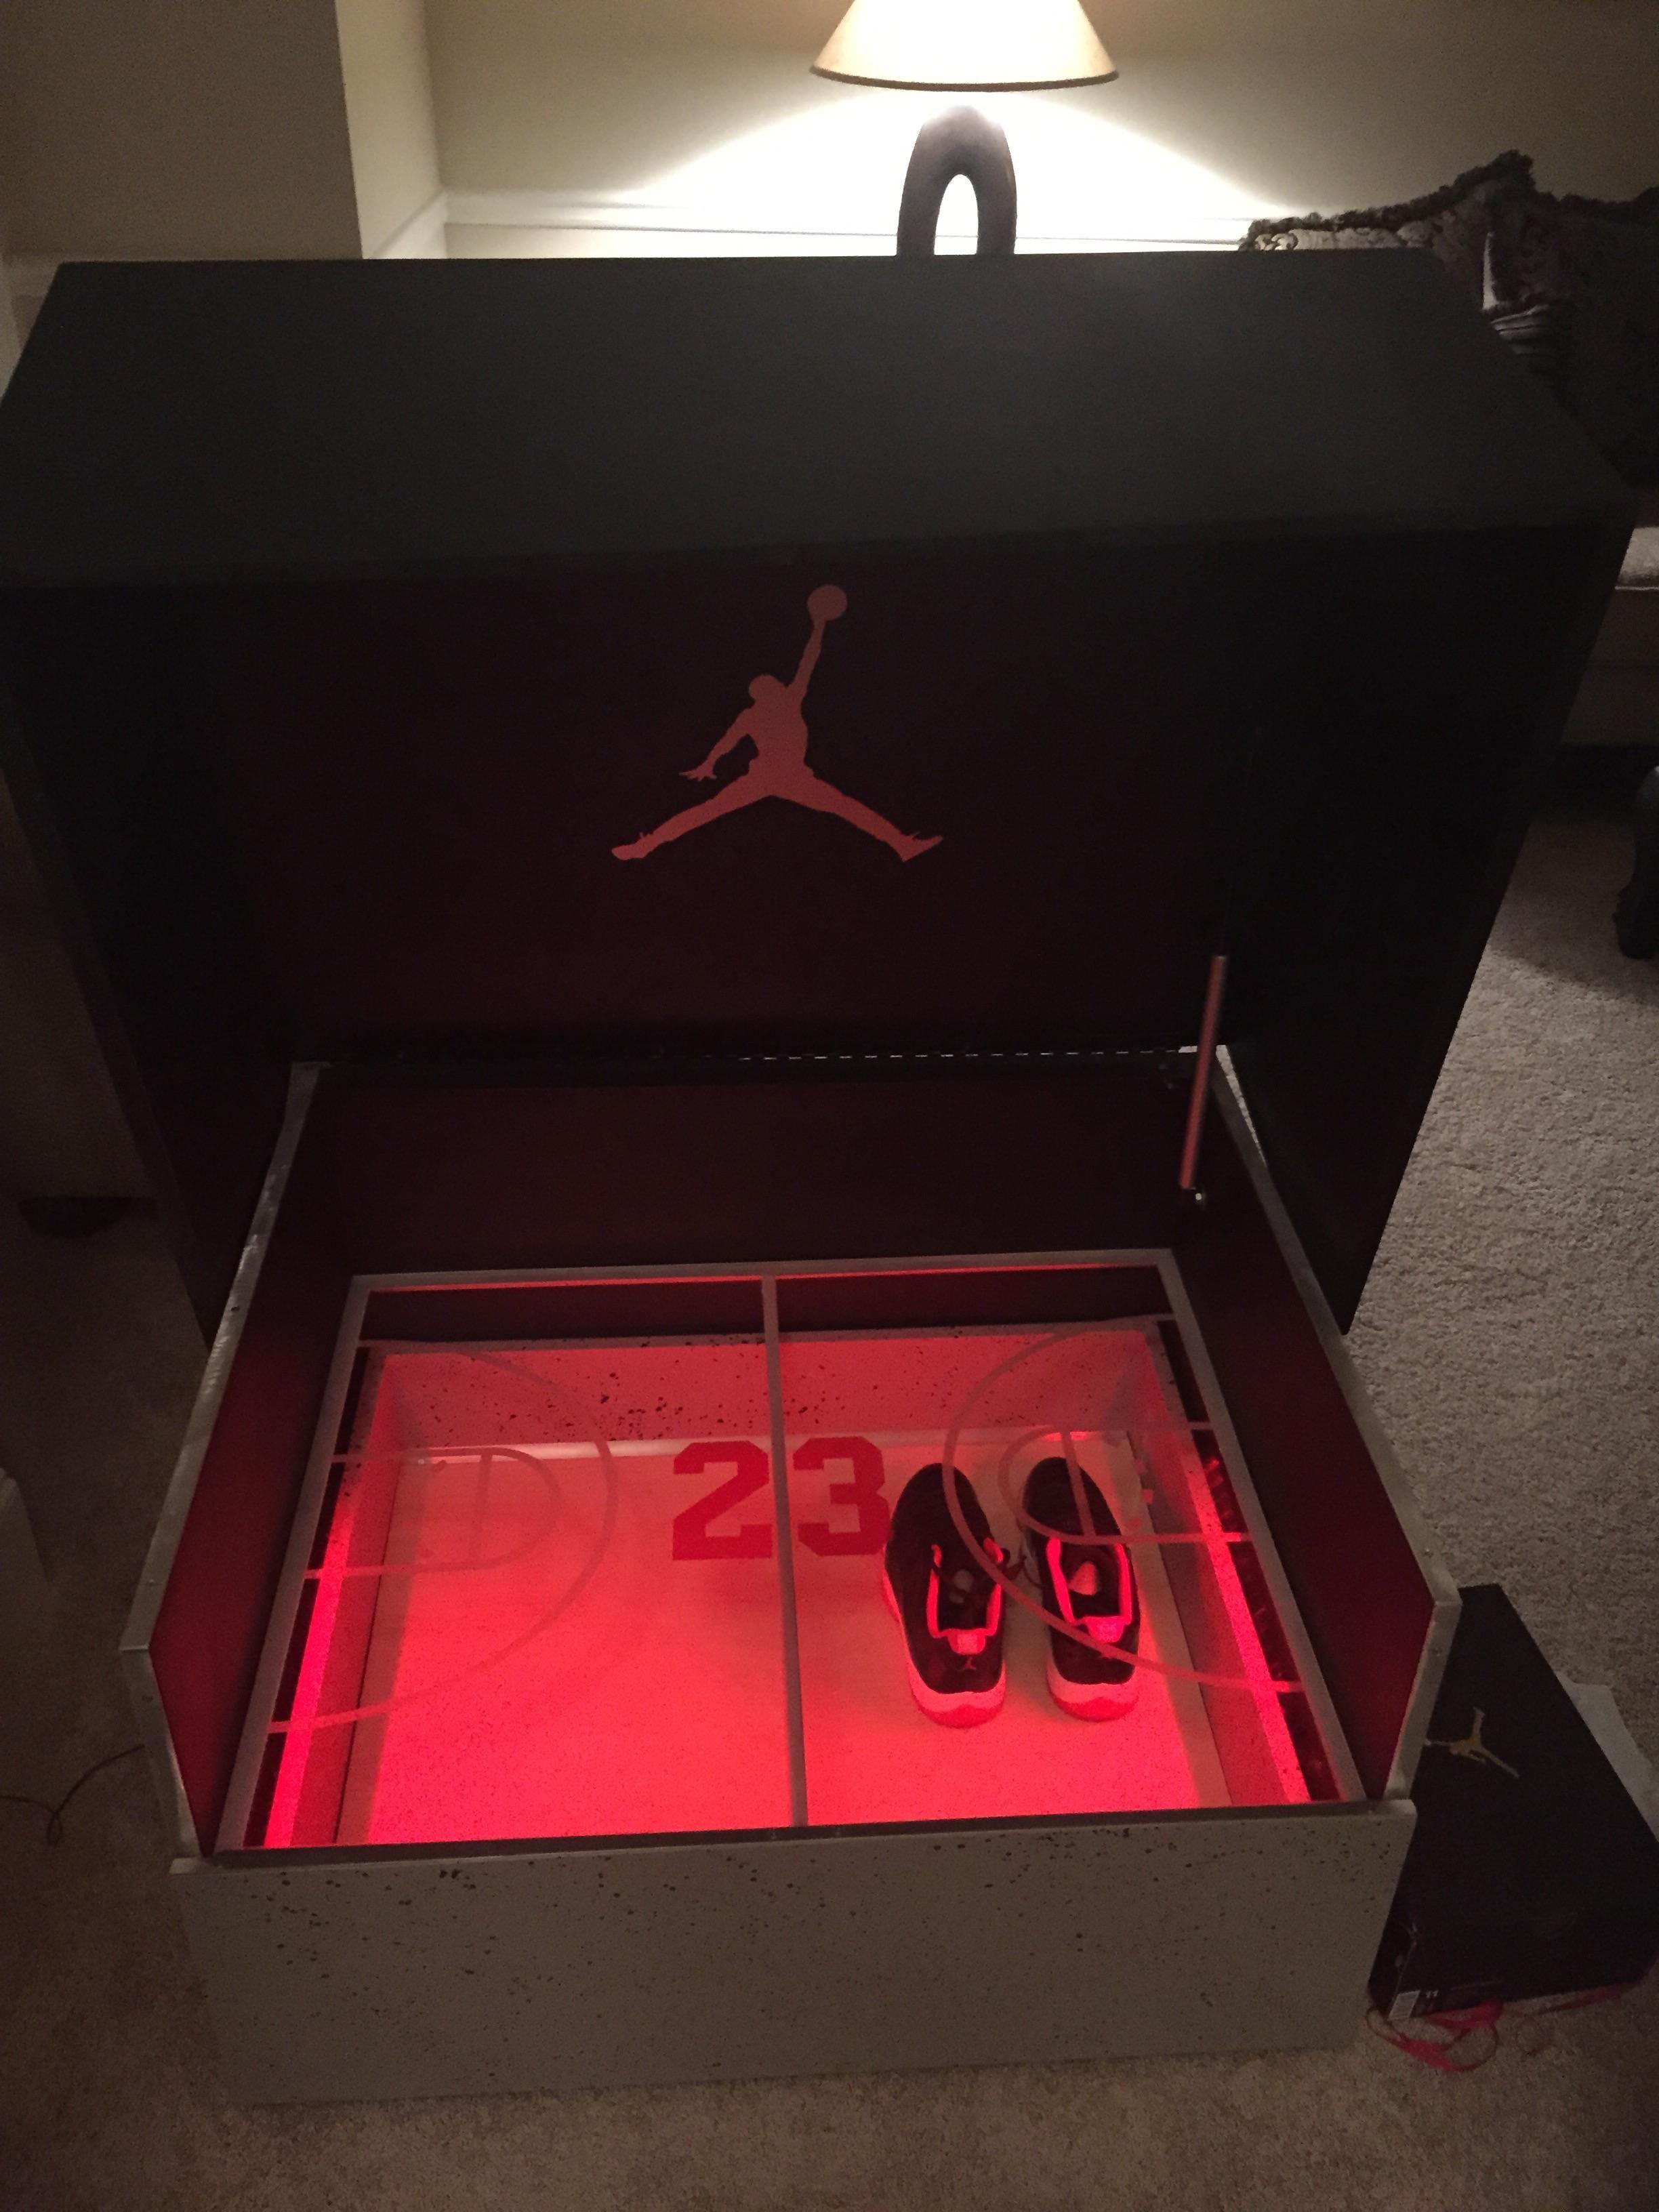 Giant Jordan Inspired Sneaker Storage Box Sneaker Storage Box Sneaker Storage Shoe Box Storage